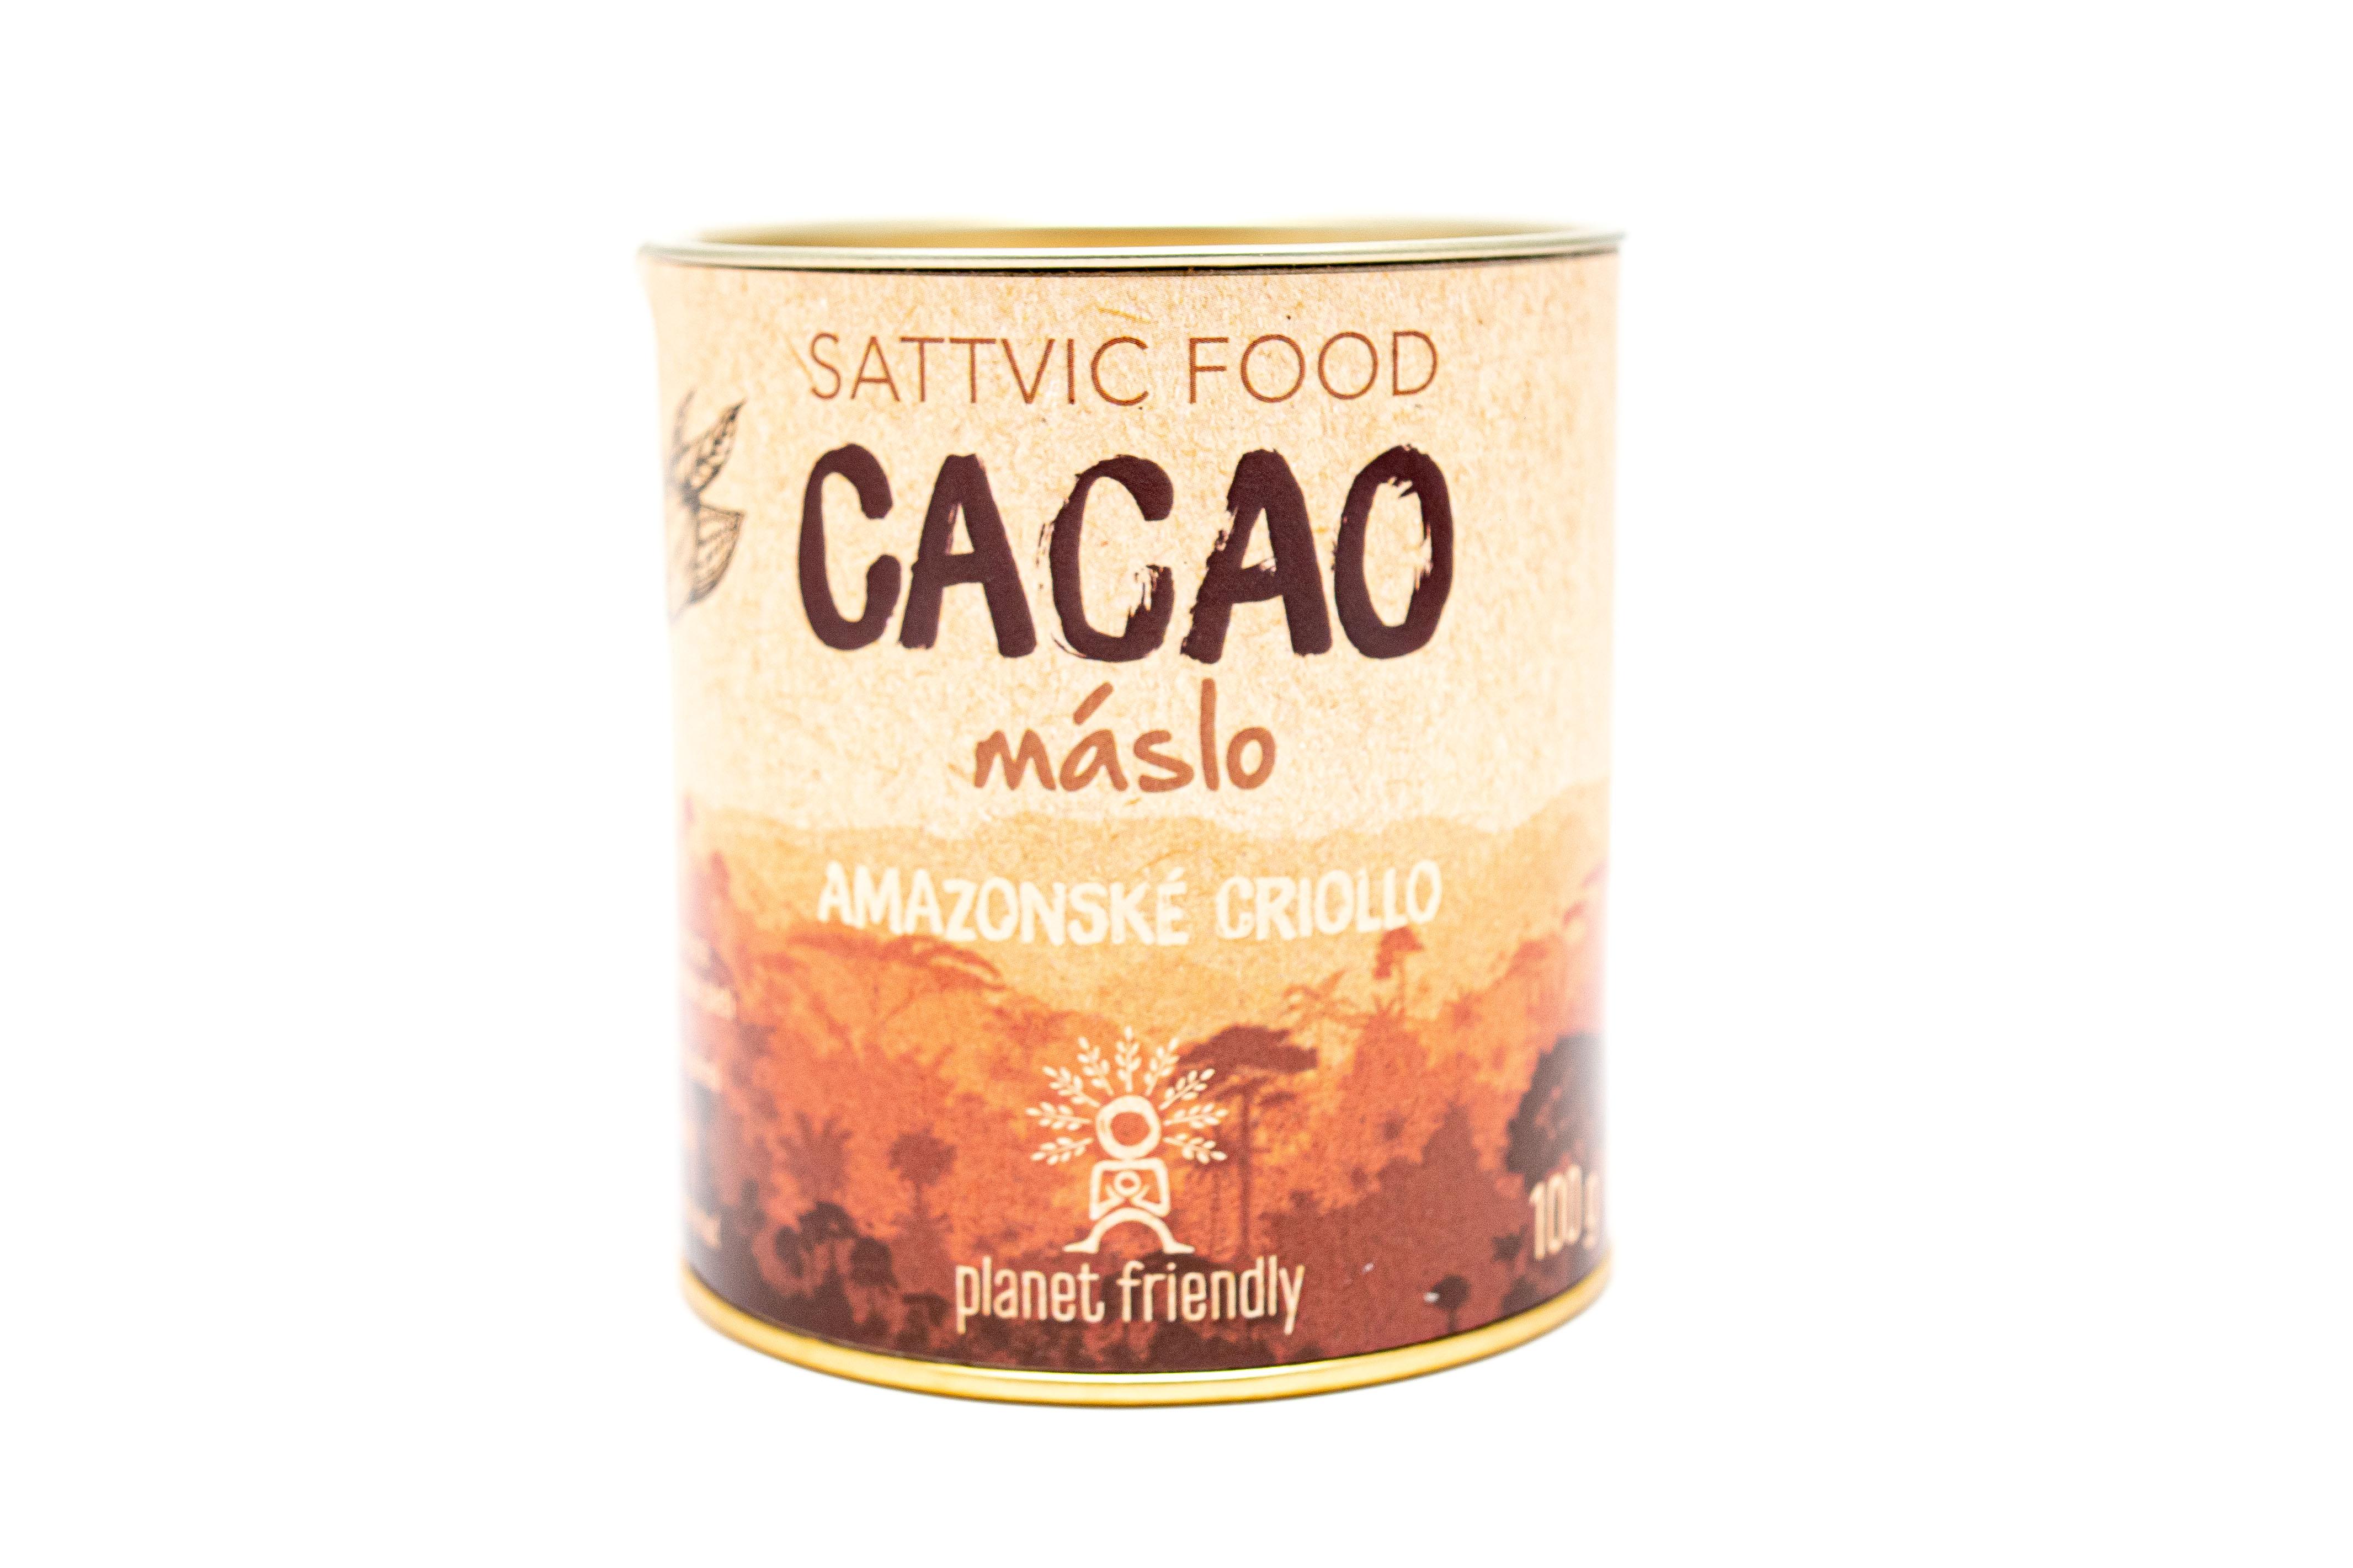 Planet Friendly Sattvic Food Cacao máslo - peruánské kakao, 100 g